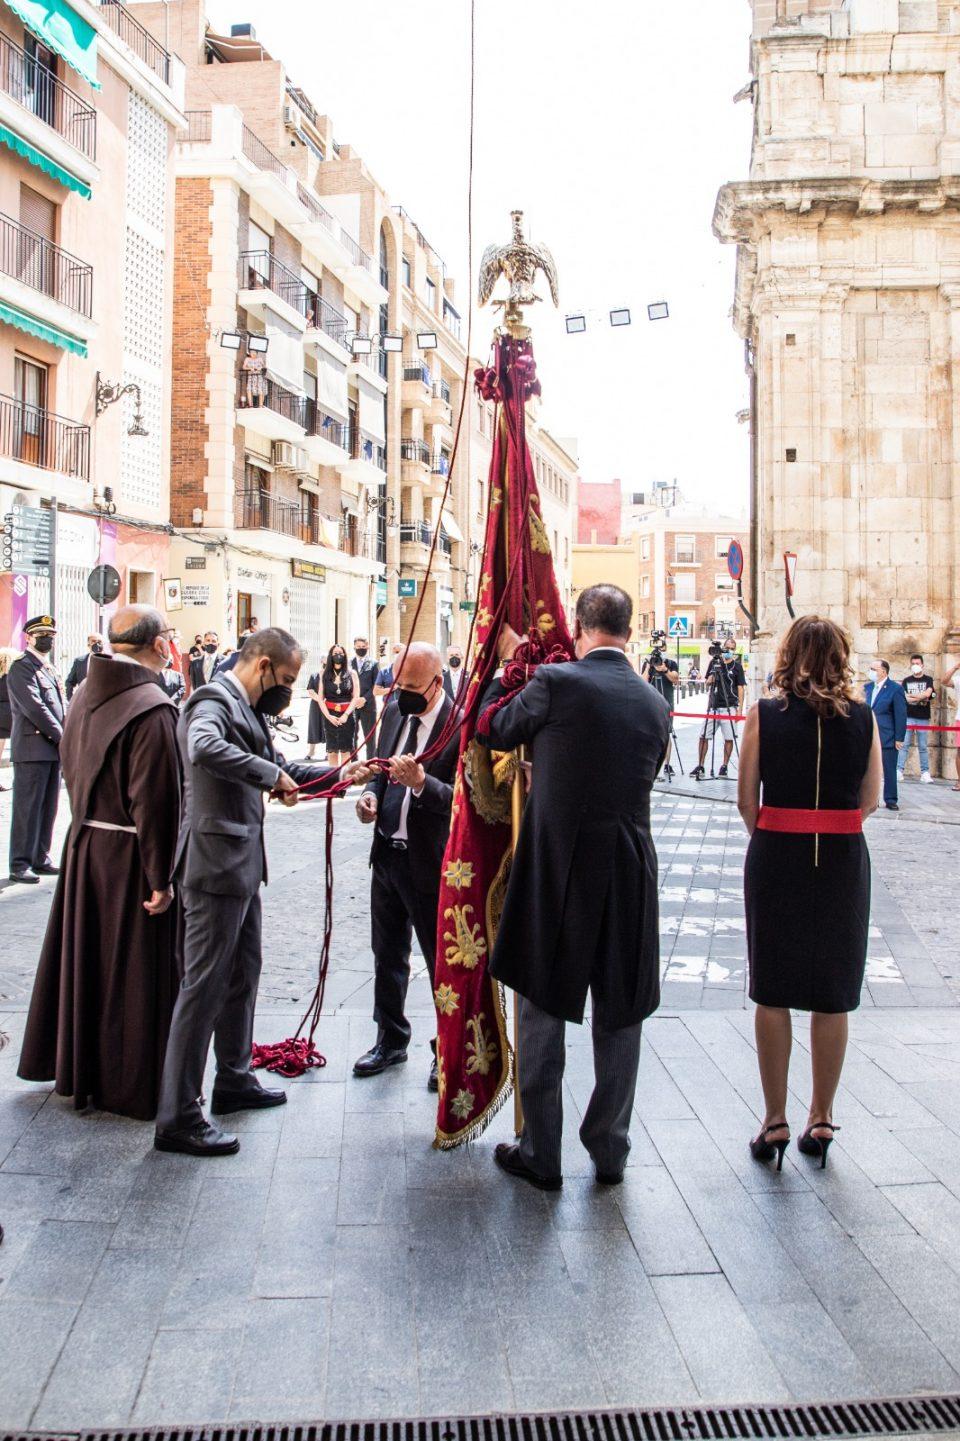 Conmemoración atípica de la Reconquista en Orihuela por segundo año consecutivo 6